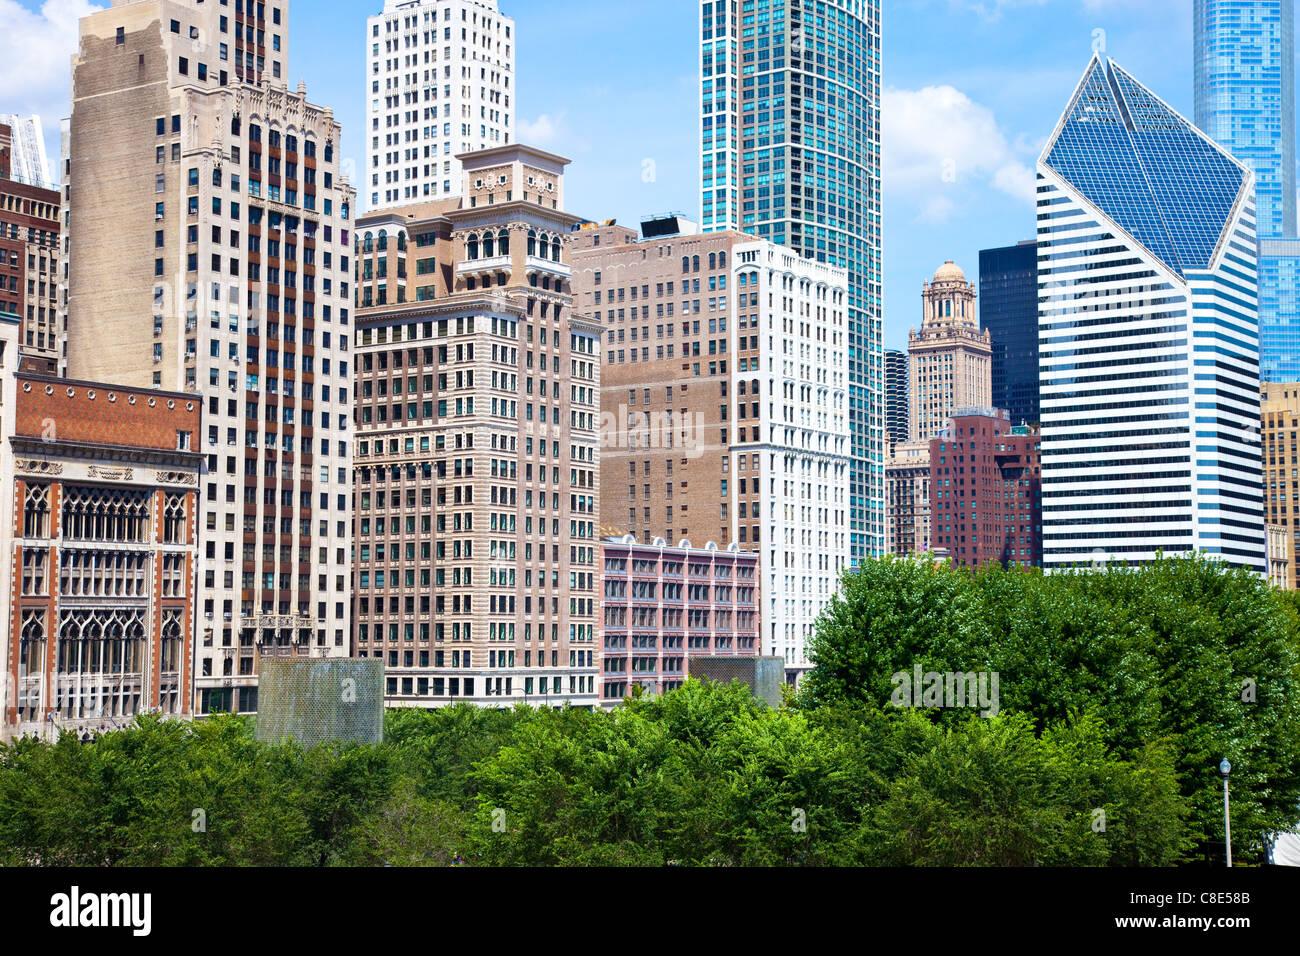 Skyline, Chicago, Illinois Photo Stock